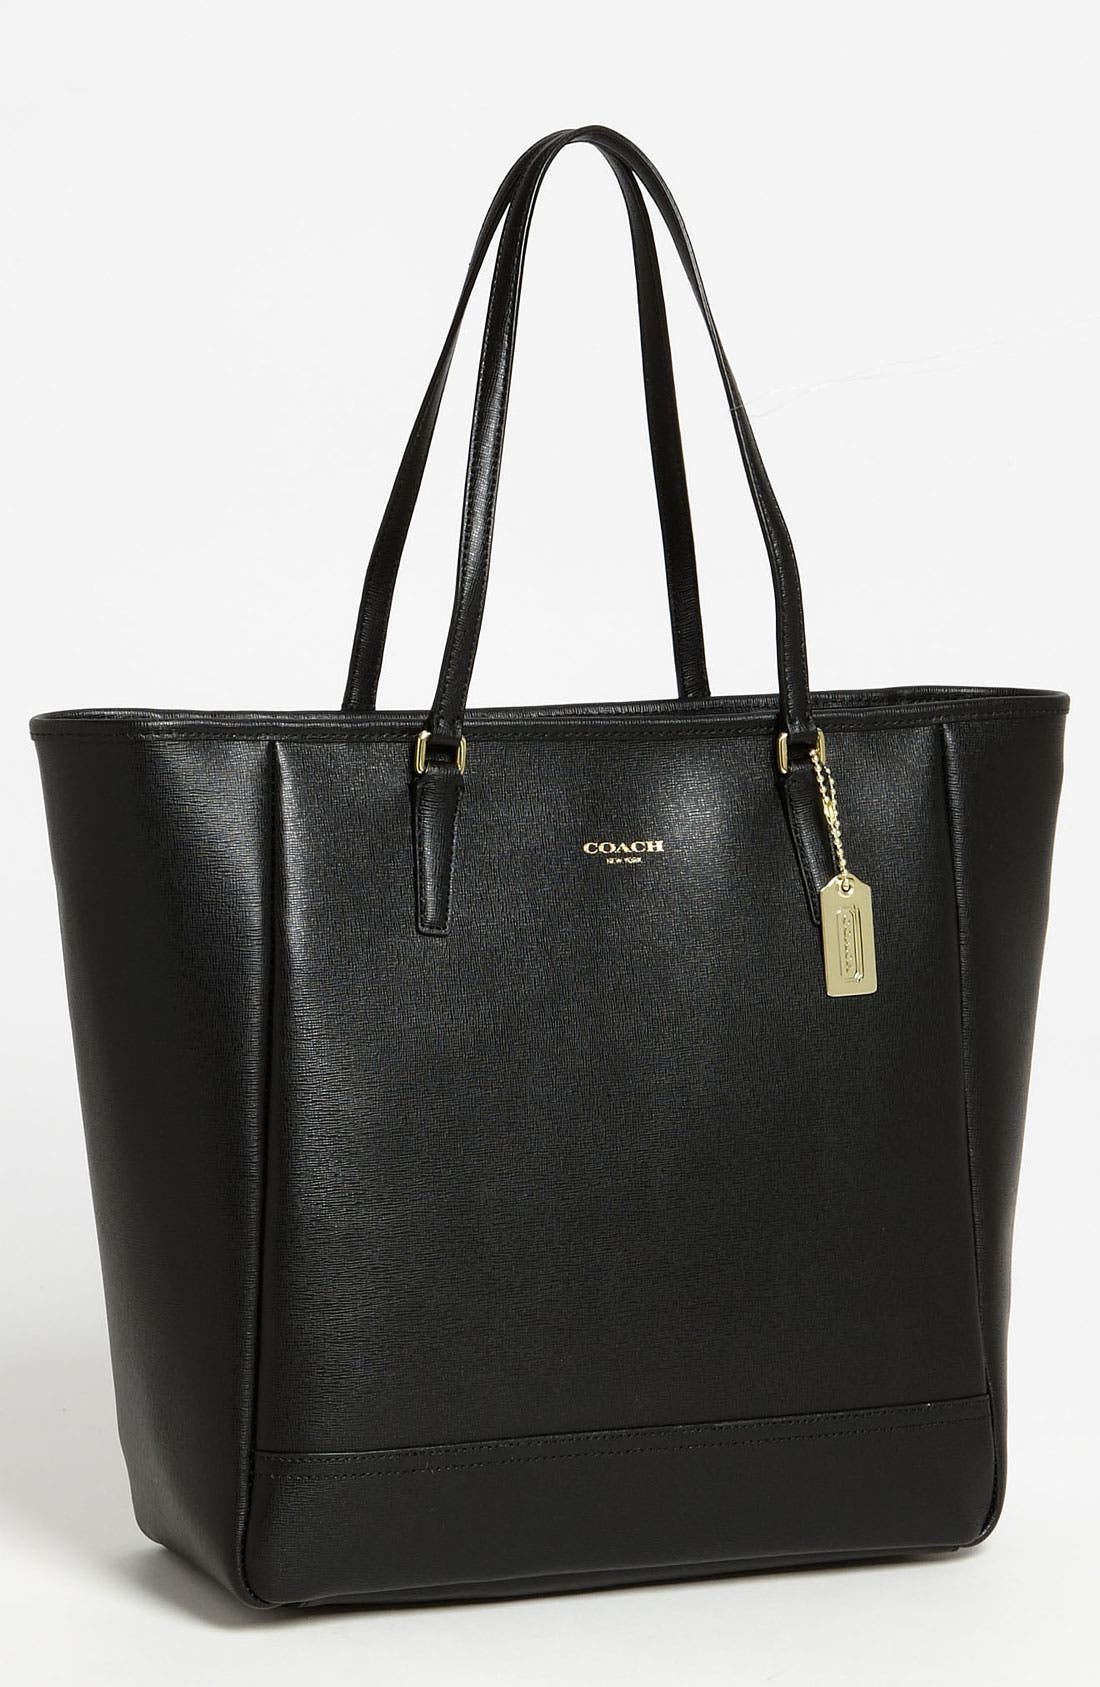 Main Image - COACH 'Medium' Leather Tote